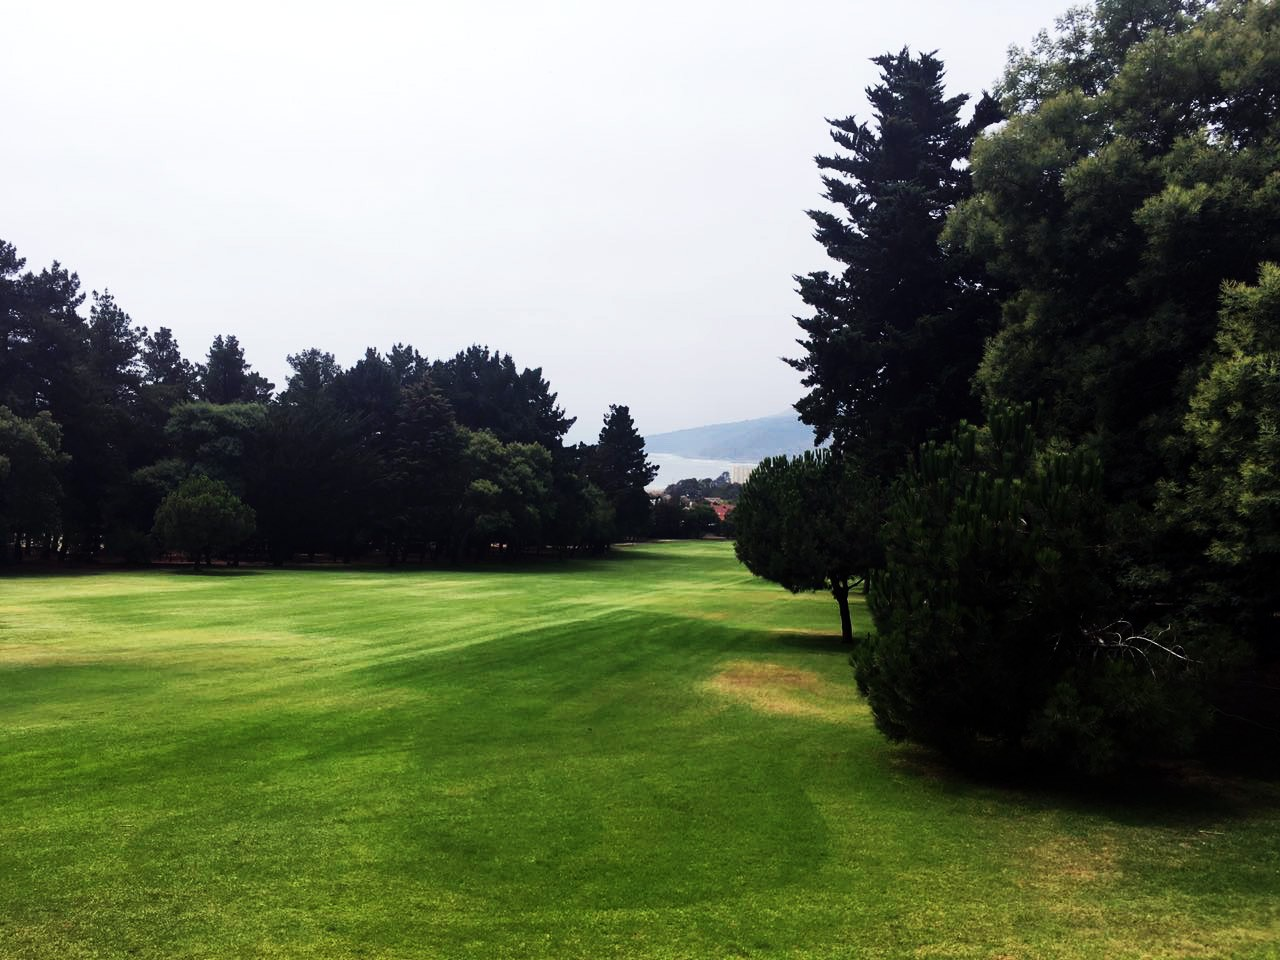 club-de-golf-papudo-arboles